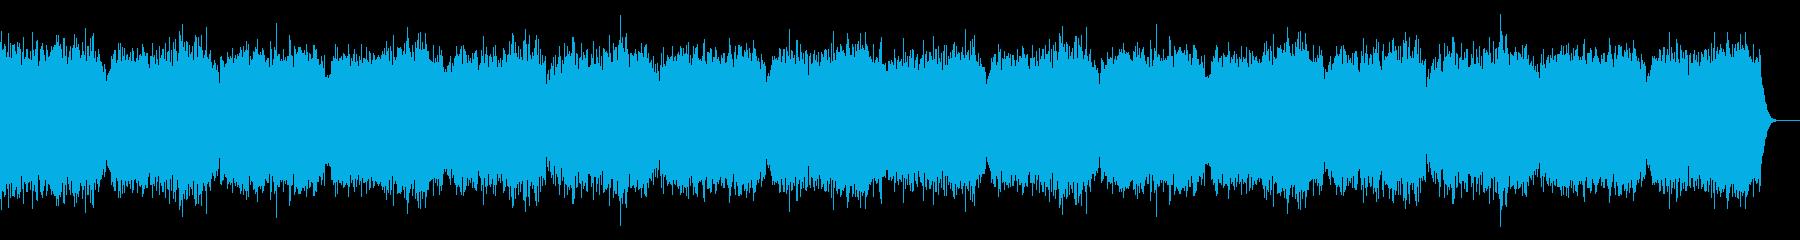 YouTube ホラー、不気味なBGMの再生済みの波形